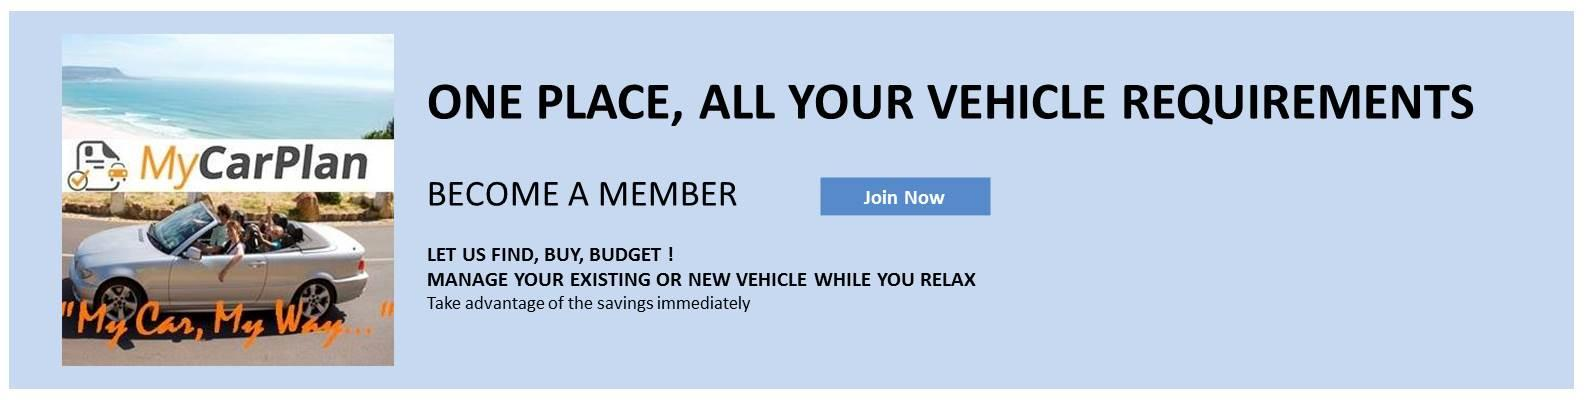 Car Purchasing